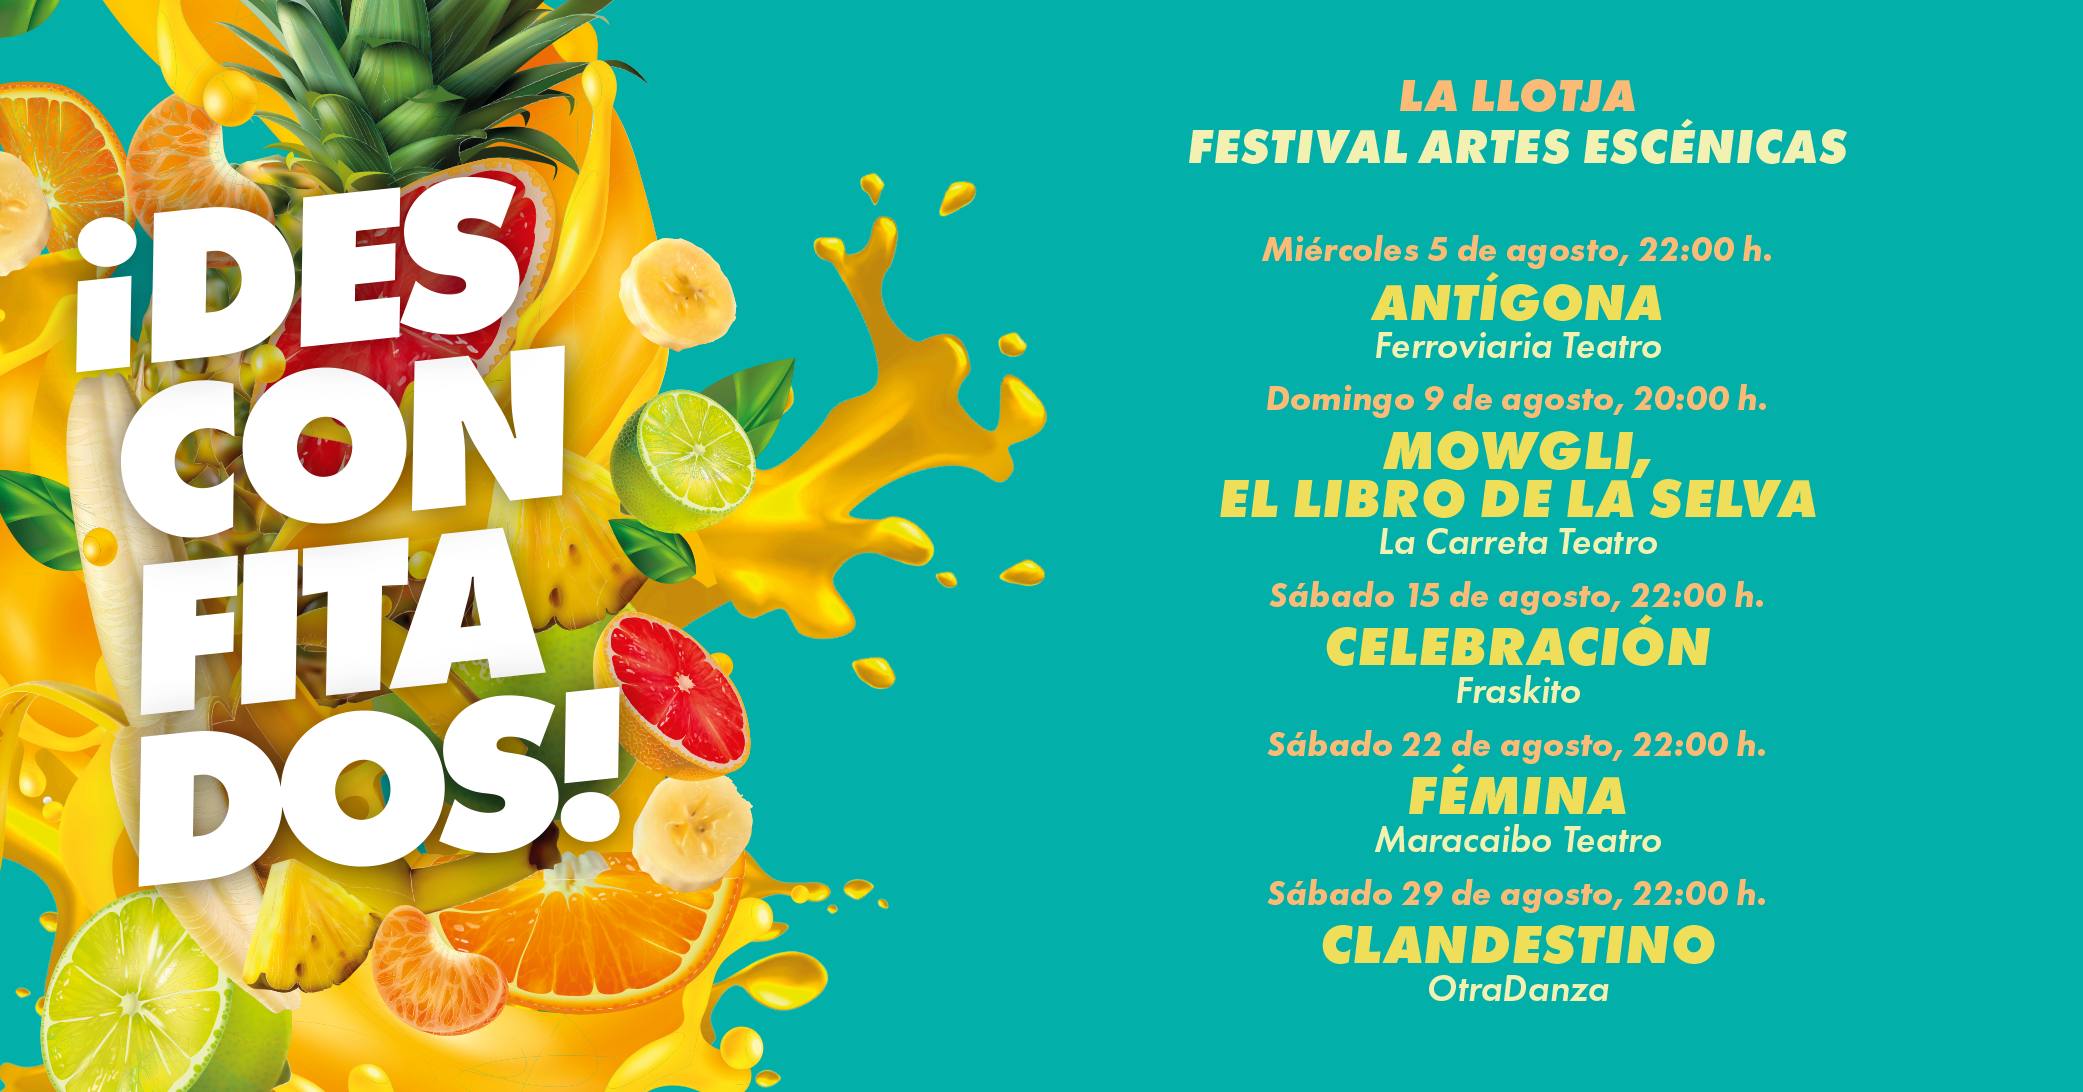 Evento Festival Artes Escénicas